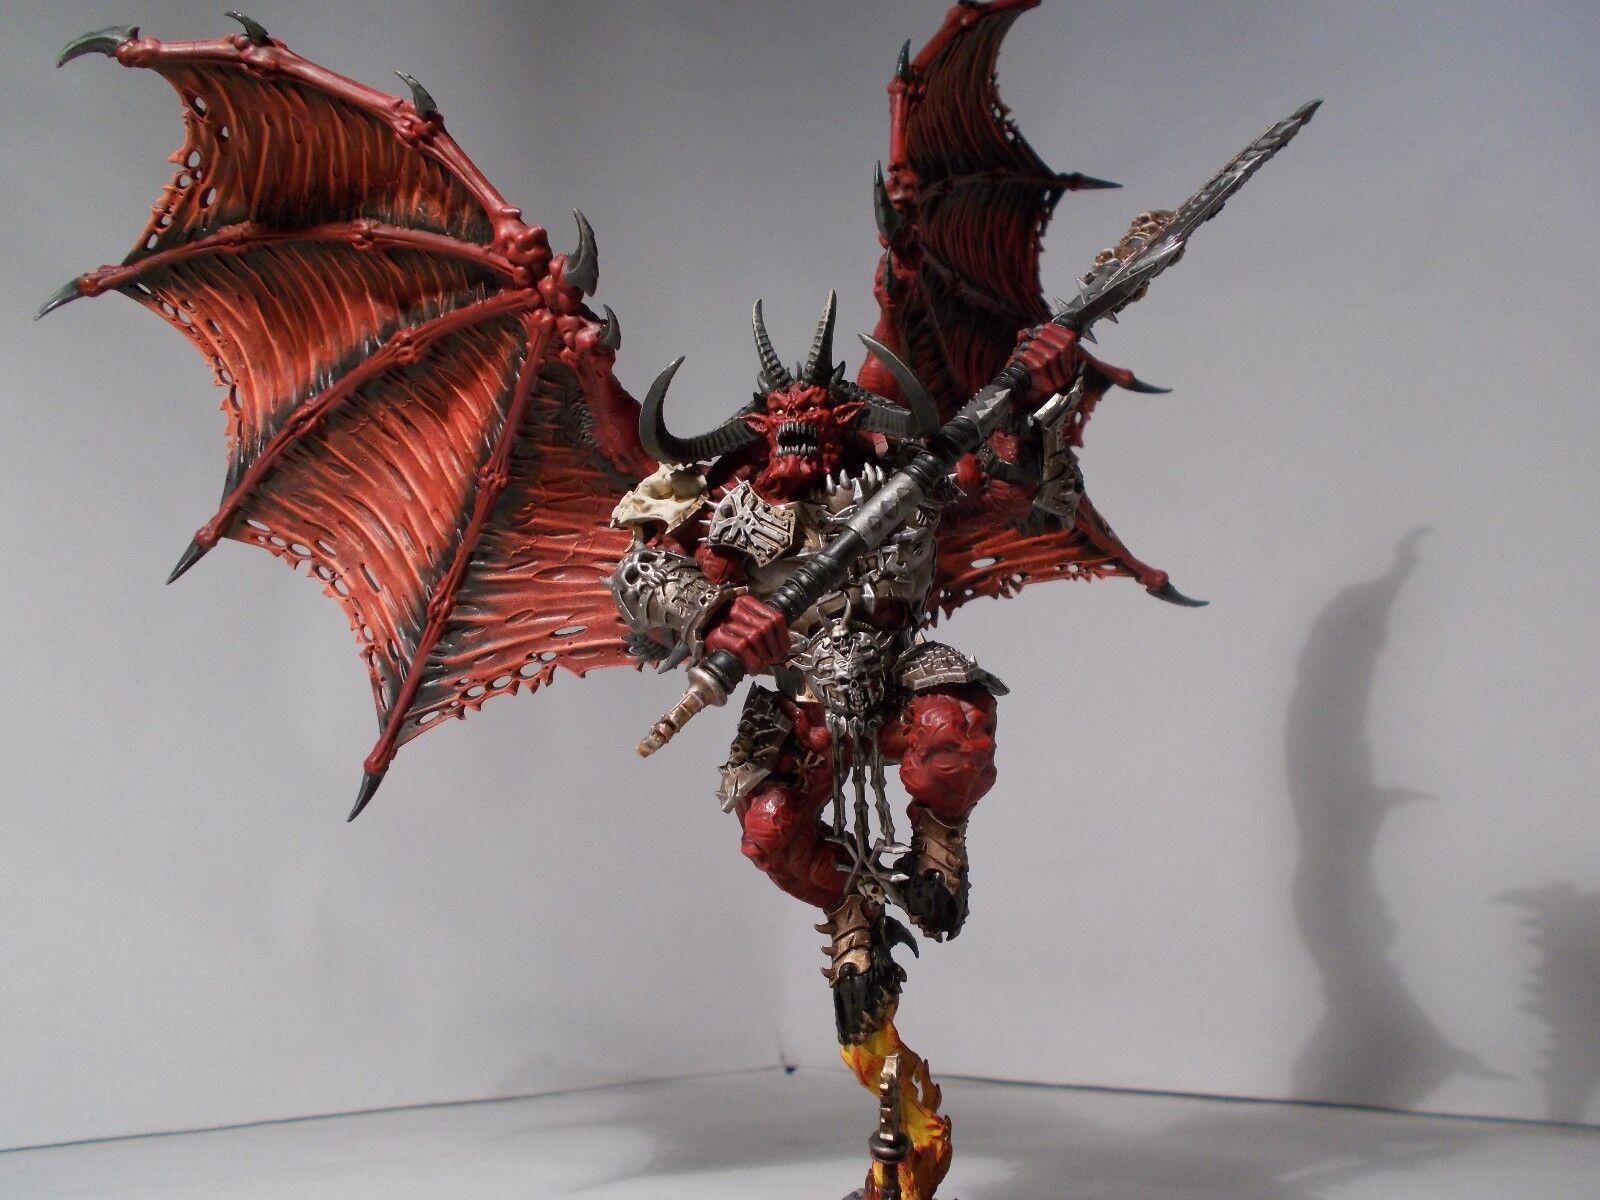 Warhammer 40k Chaos Daemons-Khorne bloodthirster Comisión Pintura